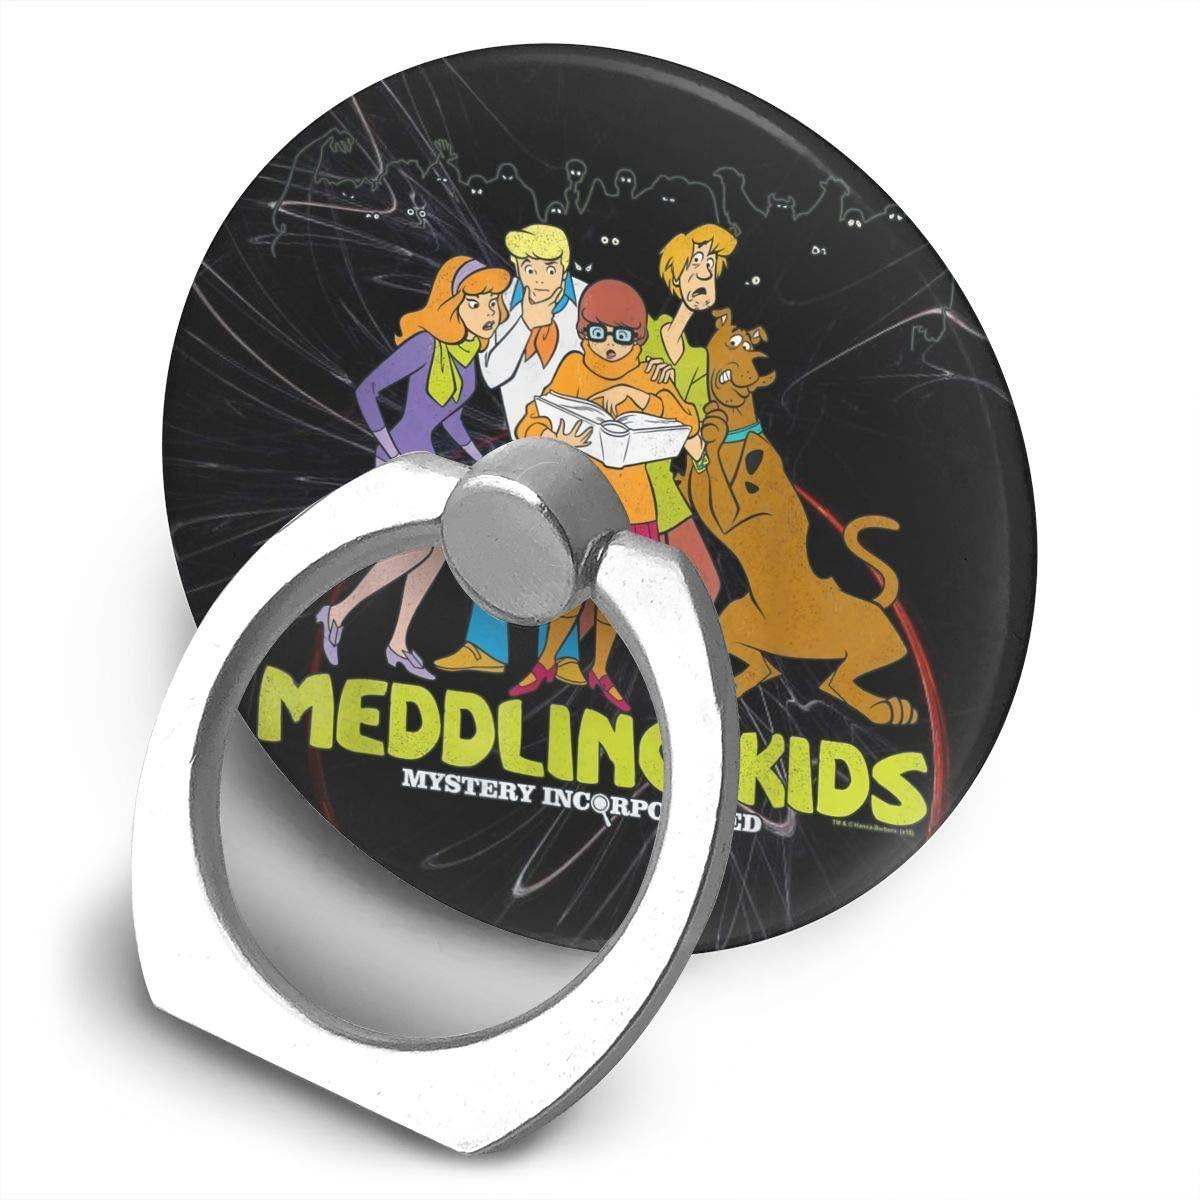 Sunlenvai Scooby-Doo Meddling Kids Finger Stand Phone Grip Holder Grip Mounts Cellphone